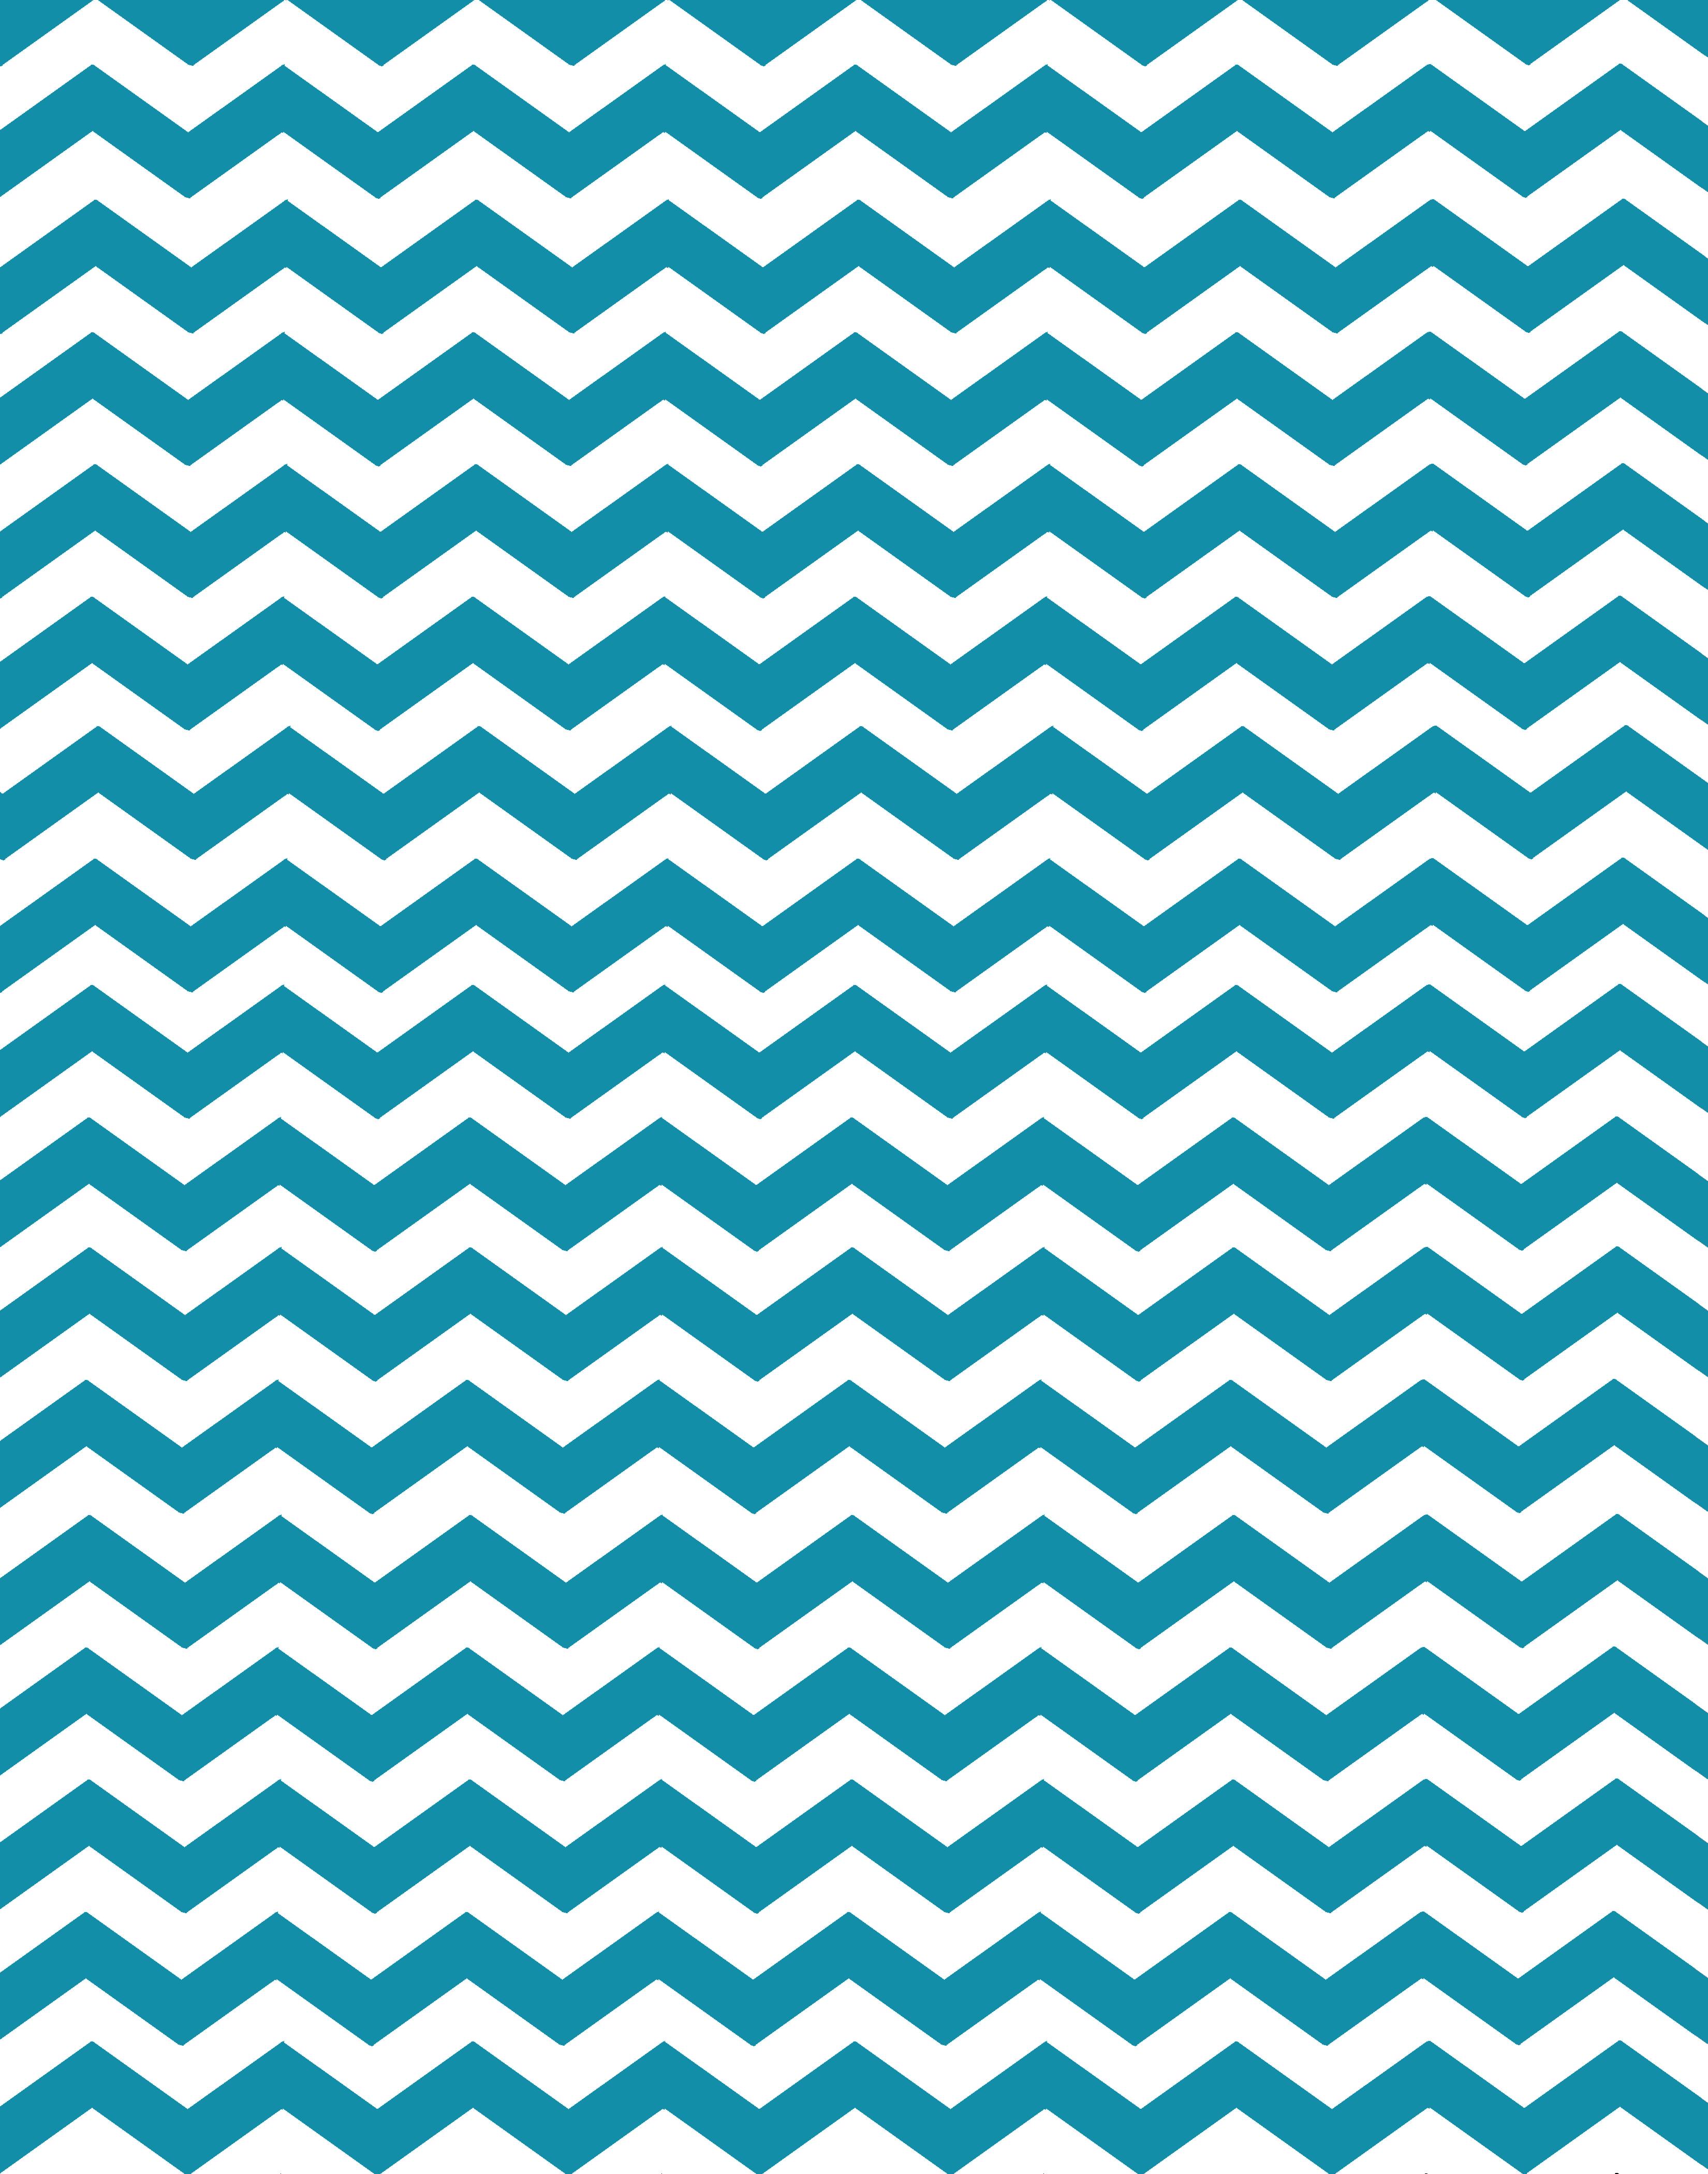 light blue chevron background - photo #19